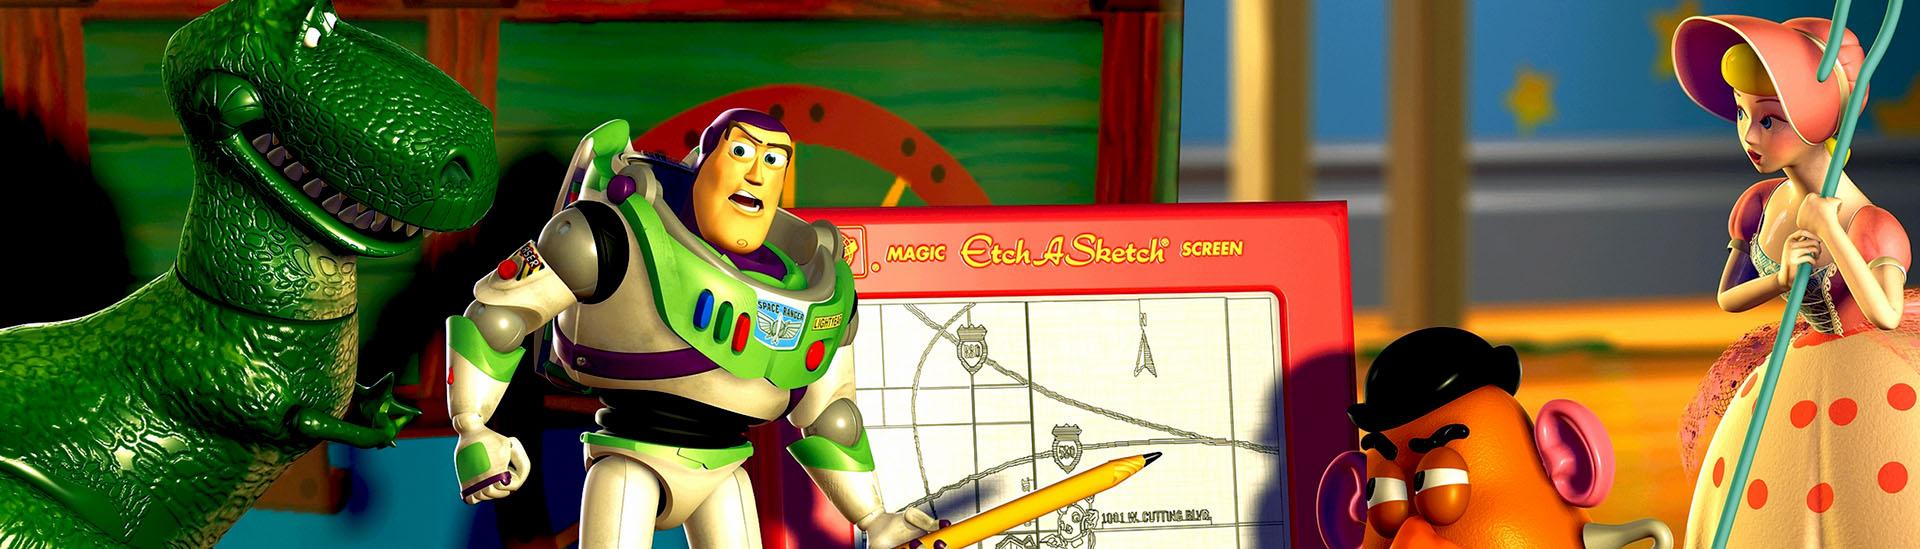 Baner filmu 'Toy Story 2 3D'